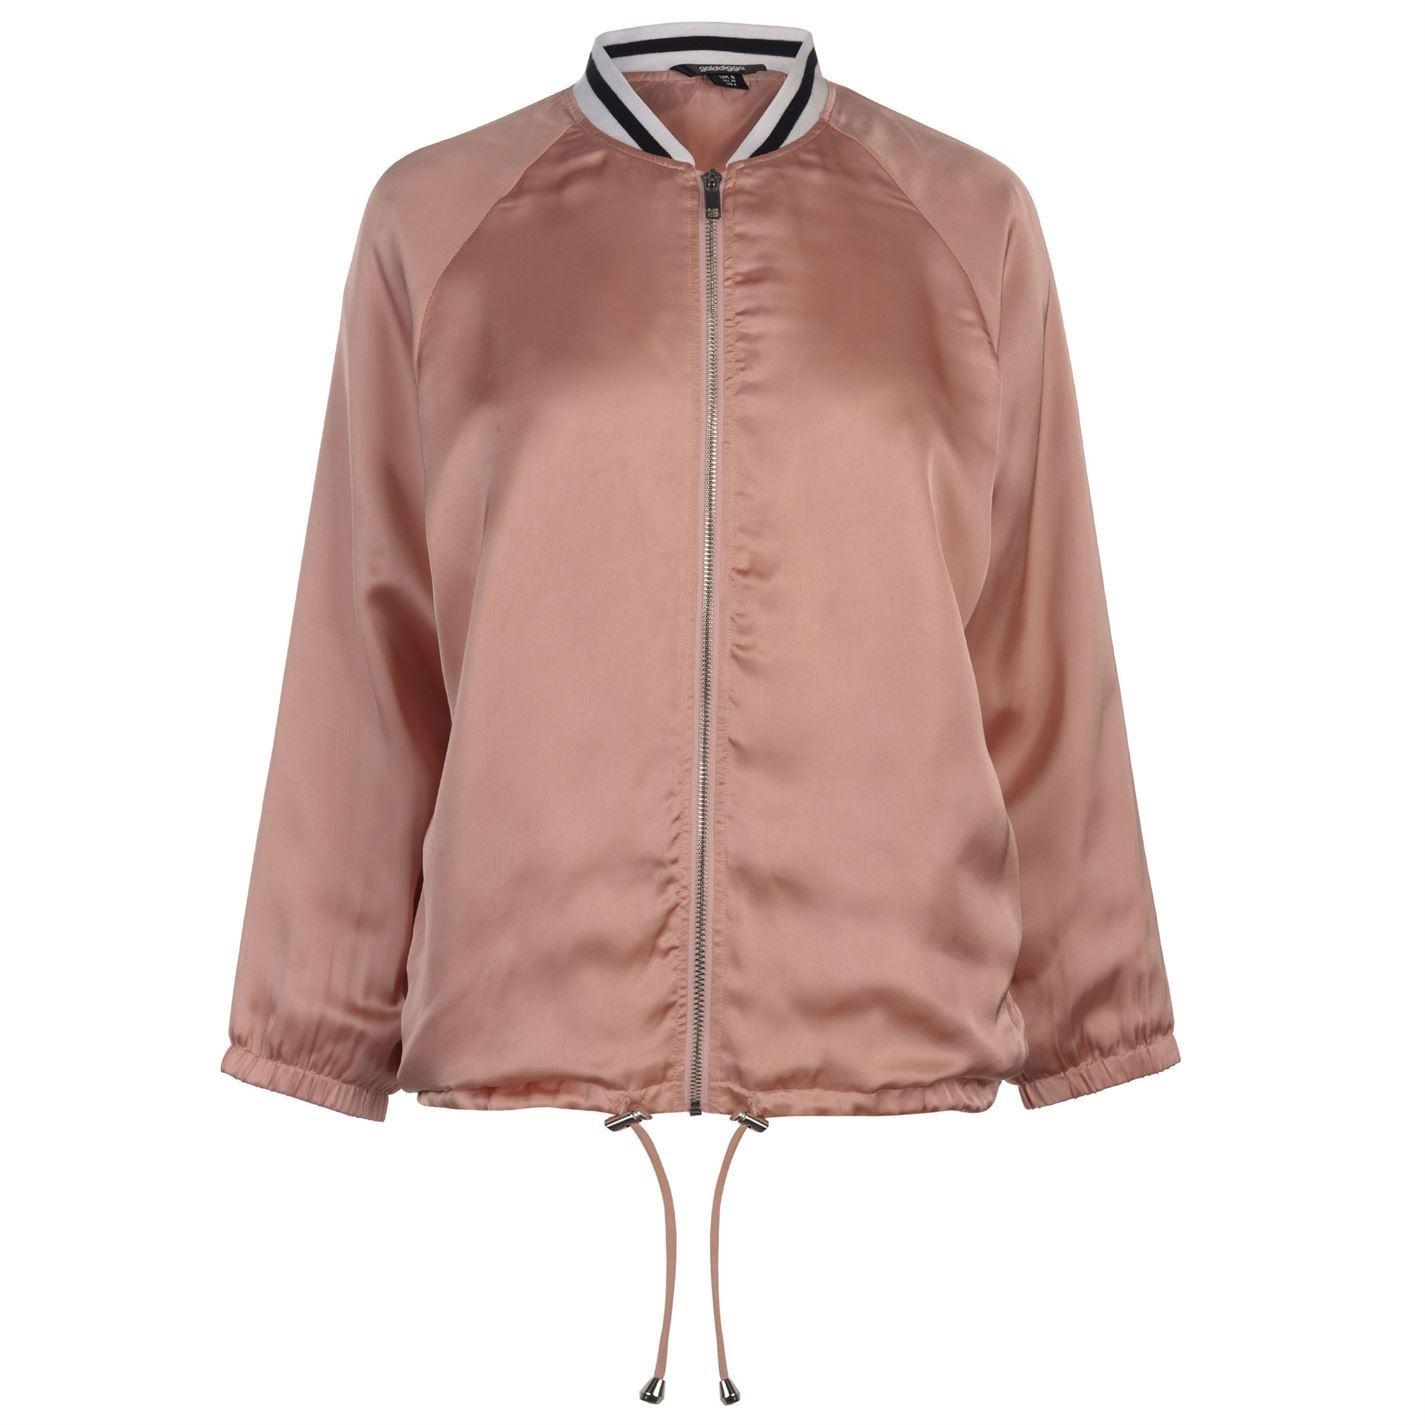 Golddigga-Bomber-Jacket-Womens-Coats-Outerwear thumbnail 8